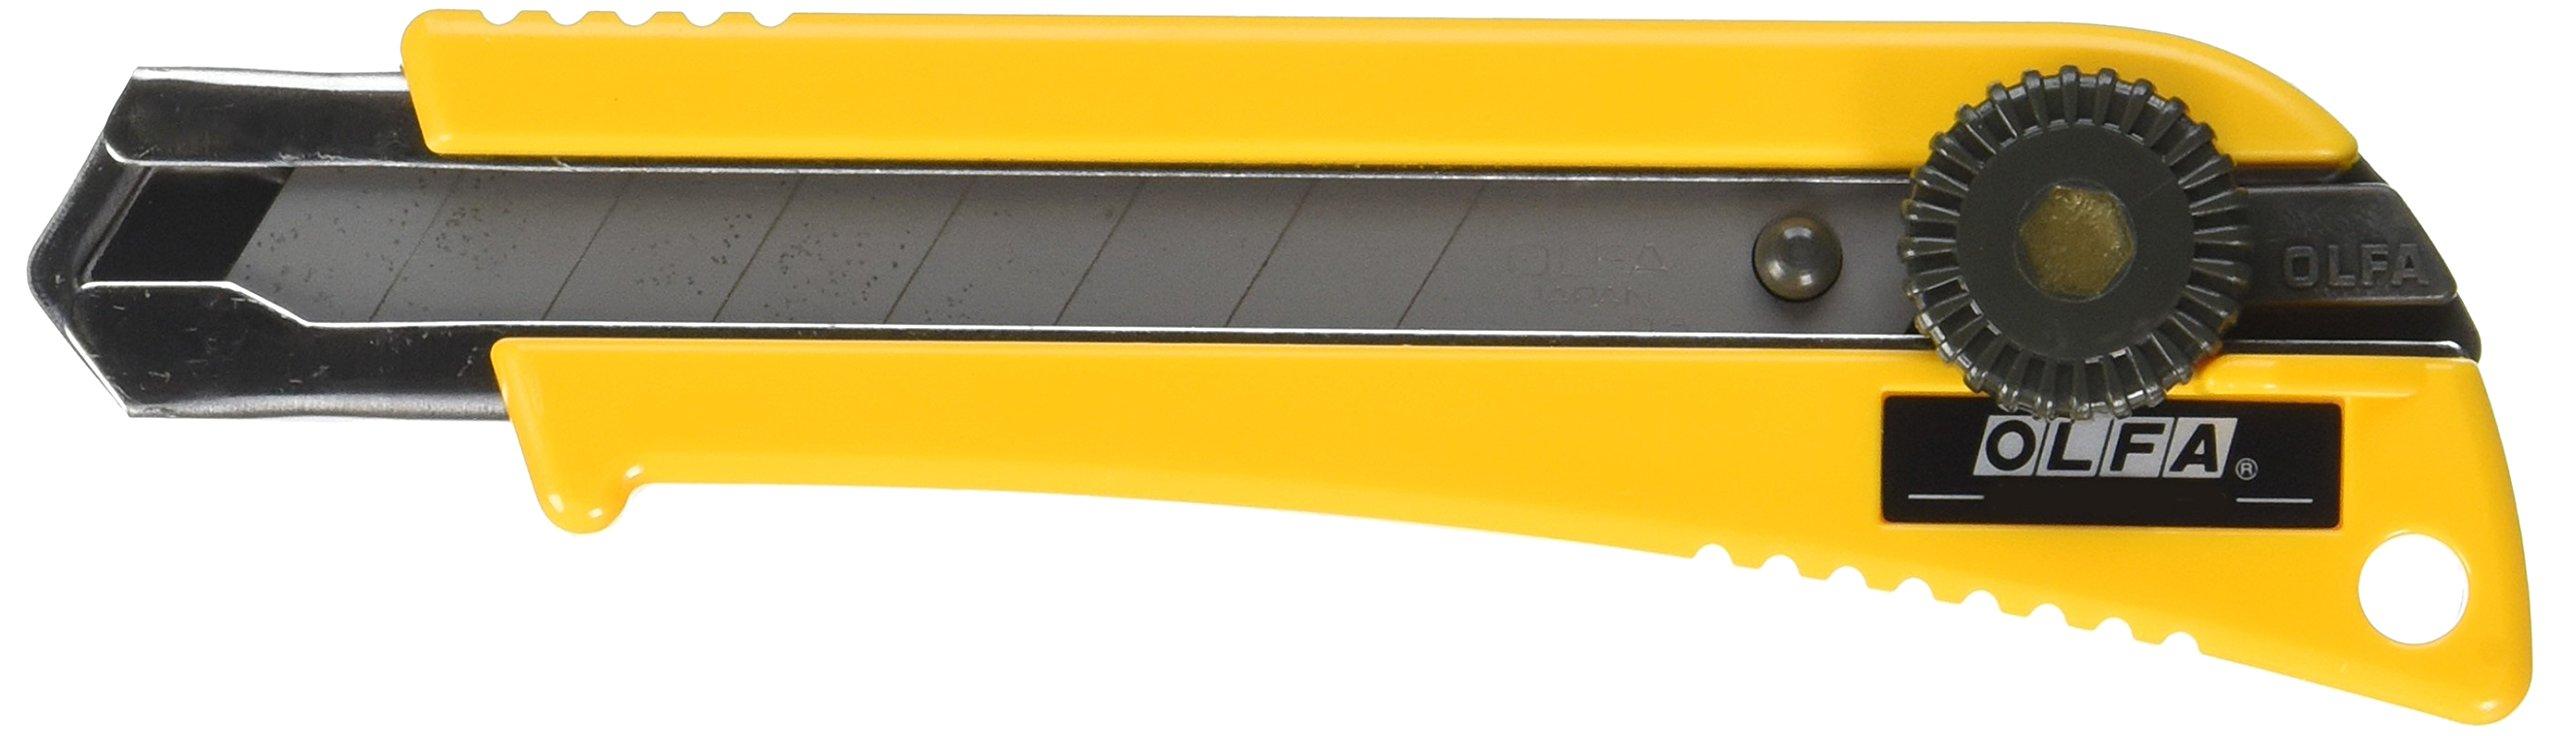 Olfa No-Slip Utility Knife (OL-L2)